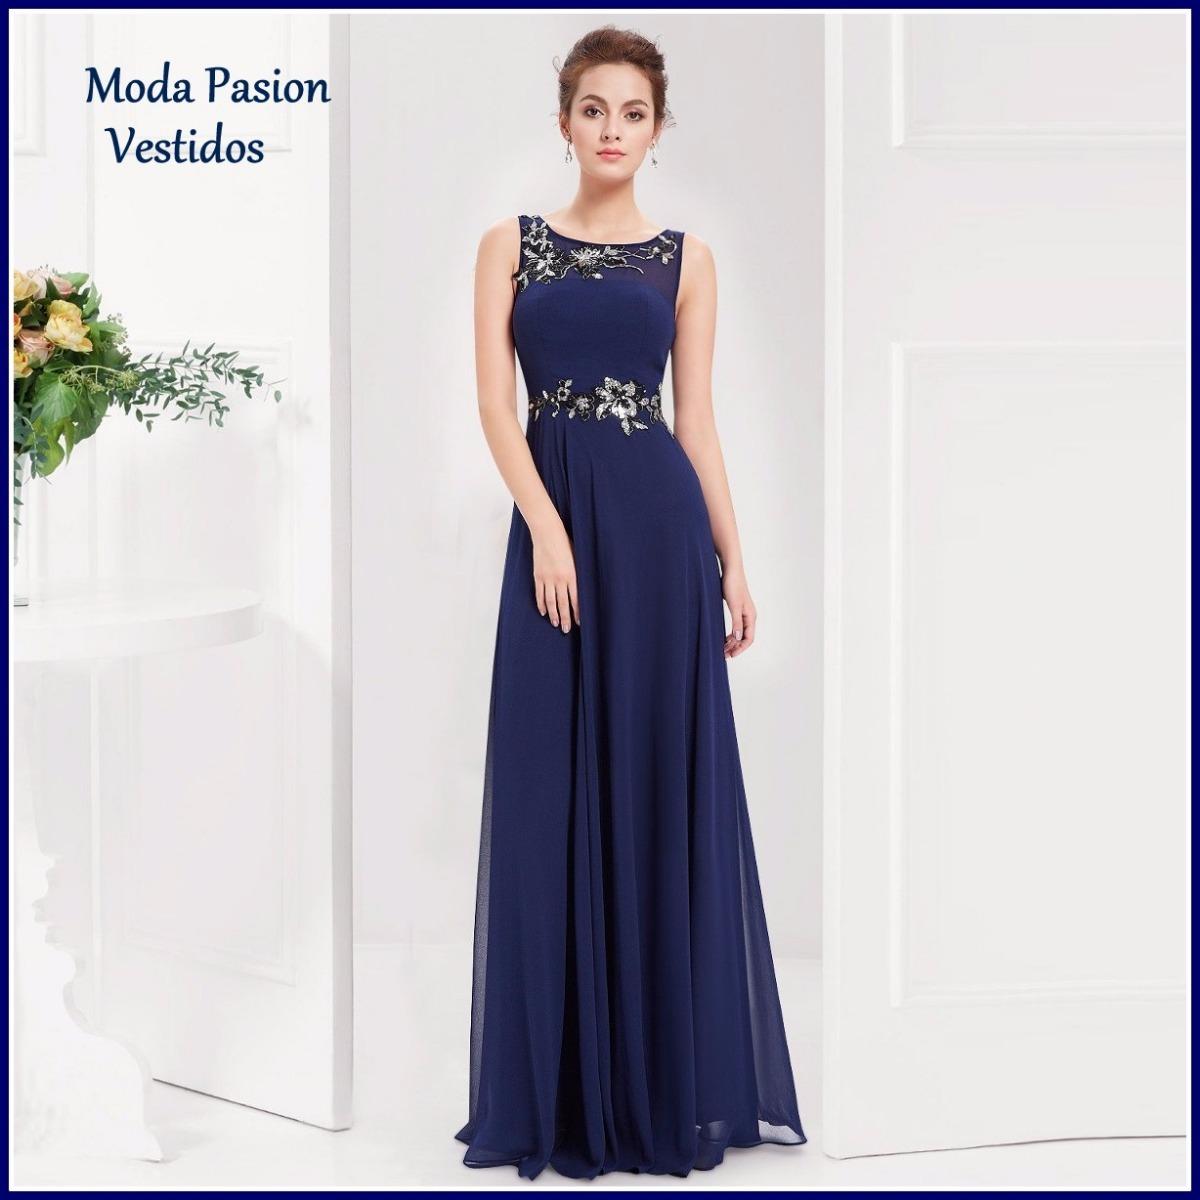 762d7d7819 vestido fiesta largo cerrado bordado madrina moda pasión. Cargando zoom.